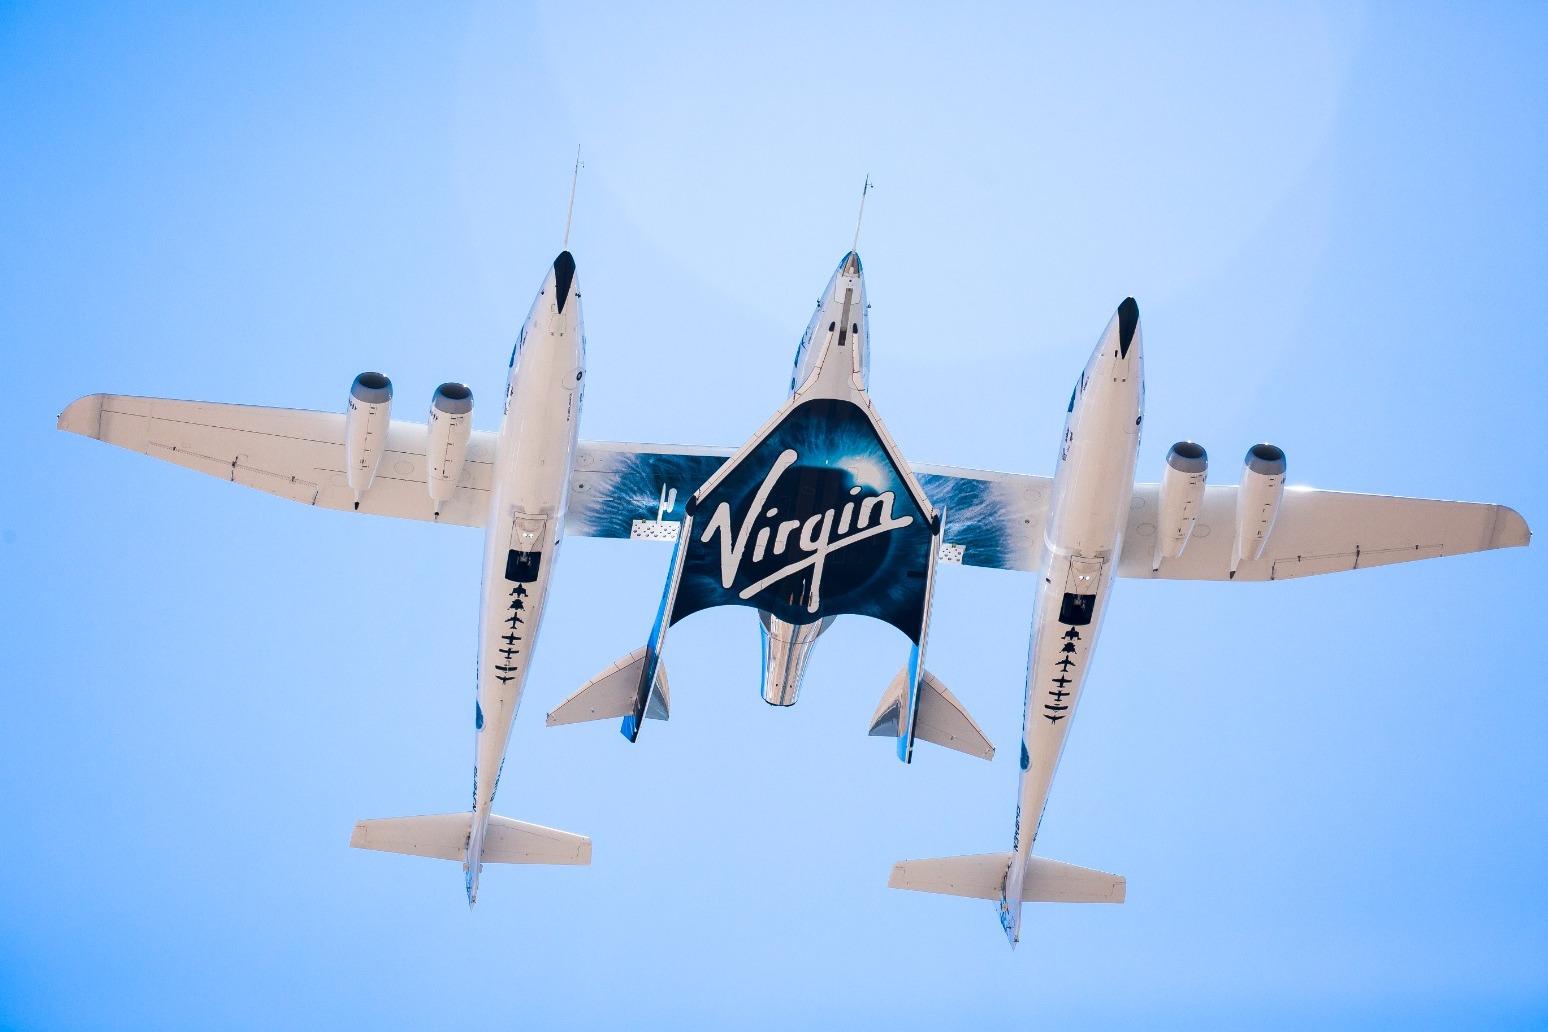 Virgin Galactic reopens ticket sales for commercial spaceflights